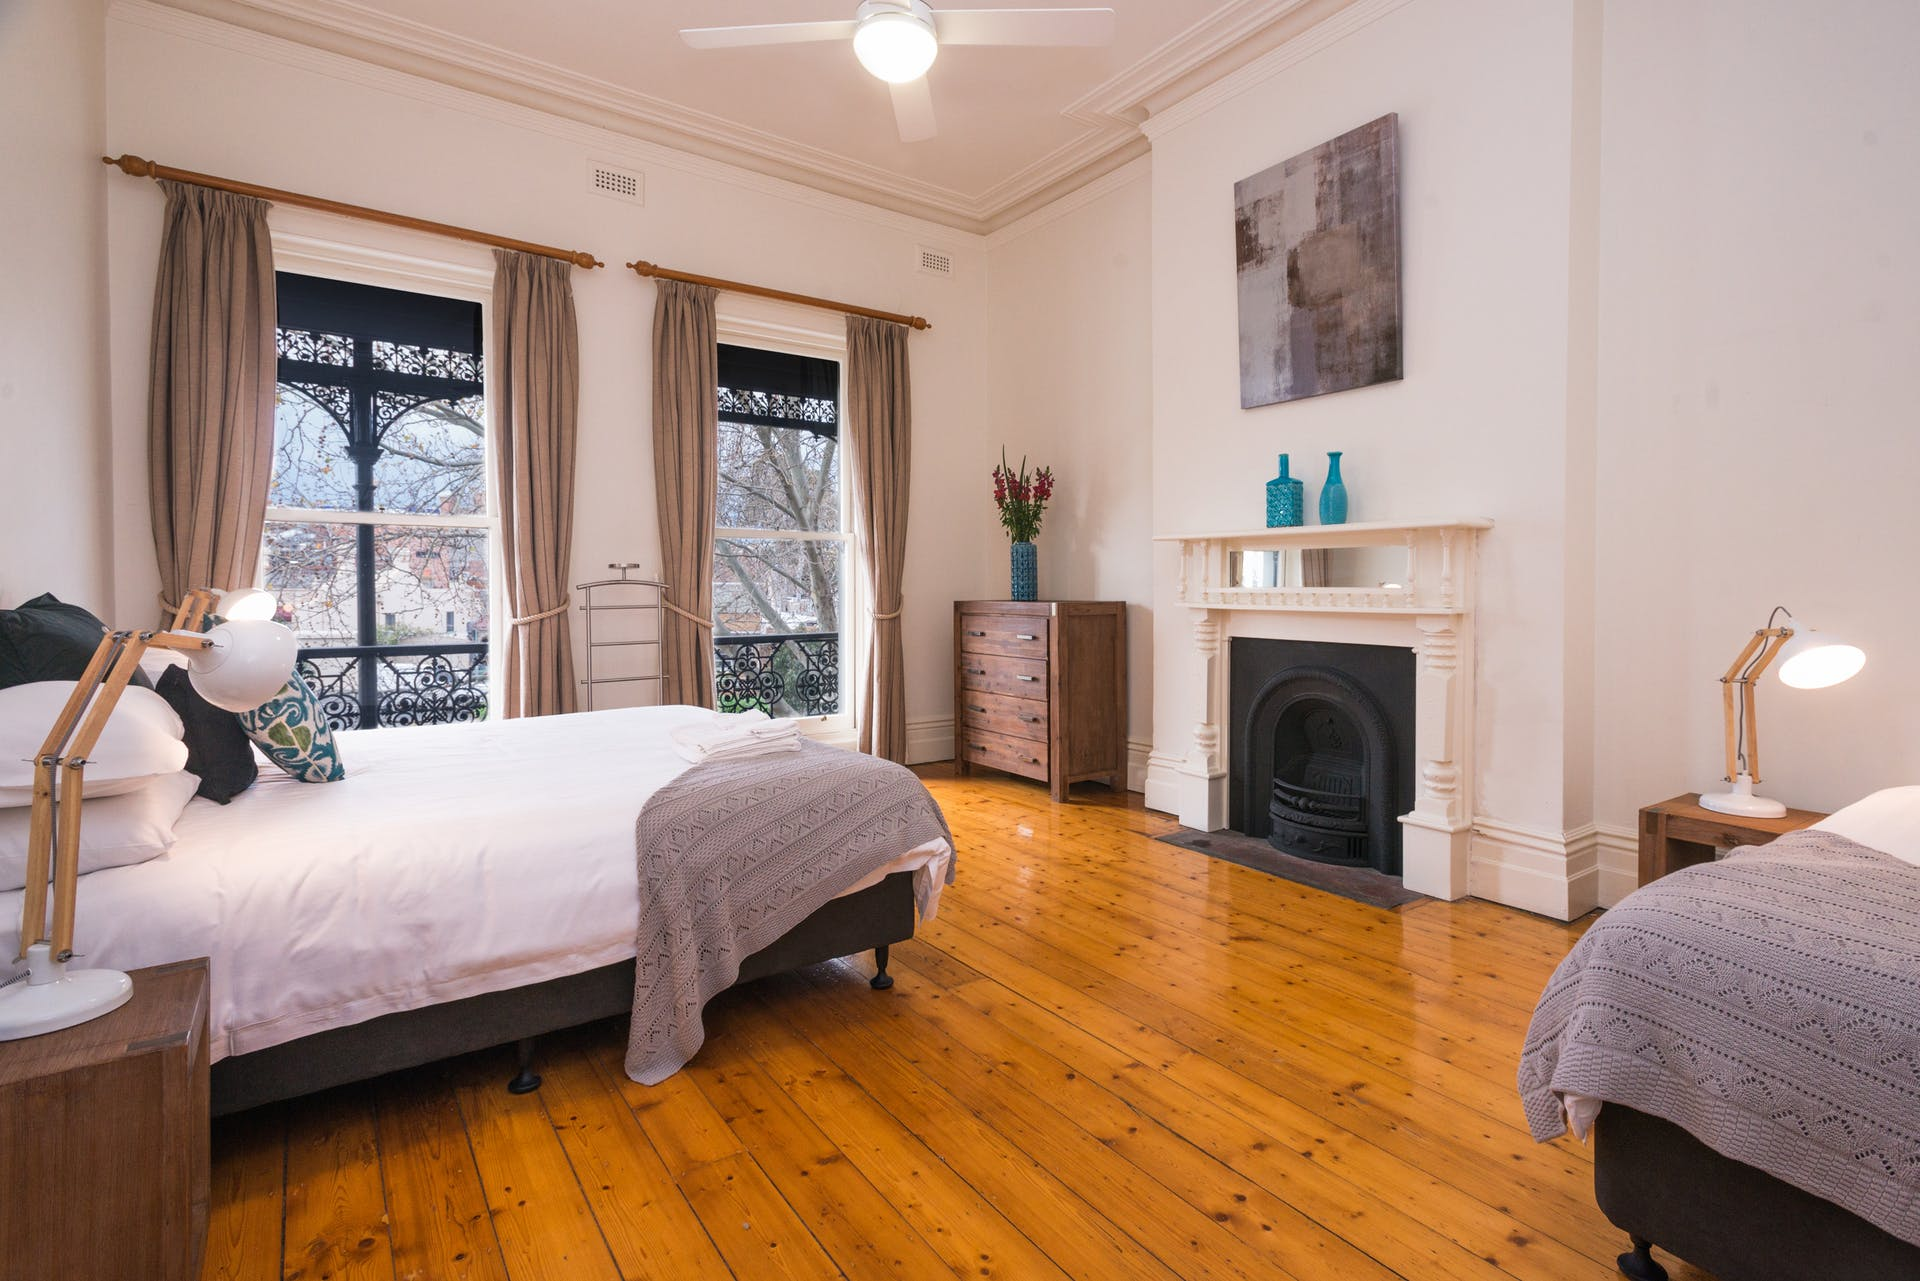 601-king-street-west-melbourne-student-accommodation-Melbourne-Bedroom-Unilodgers